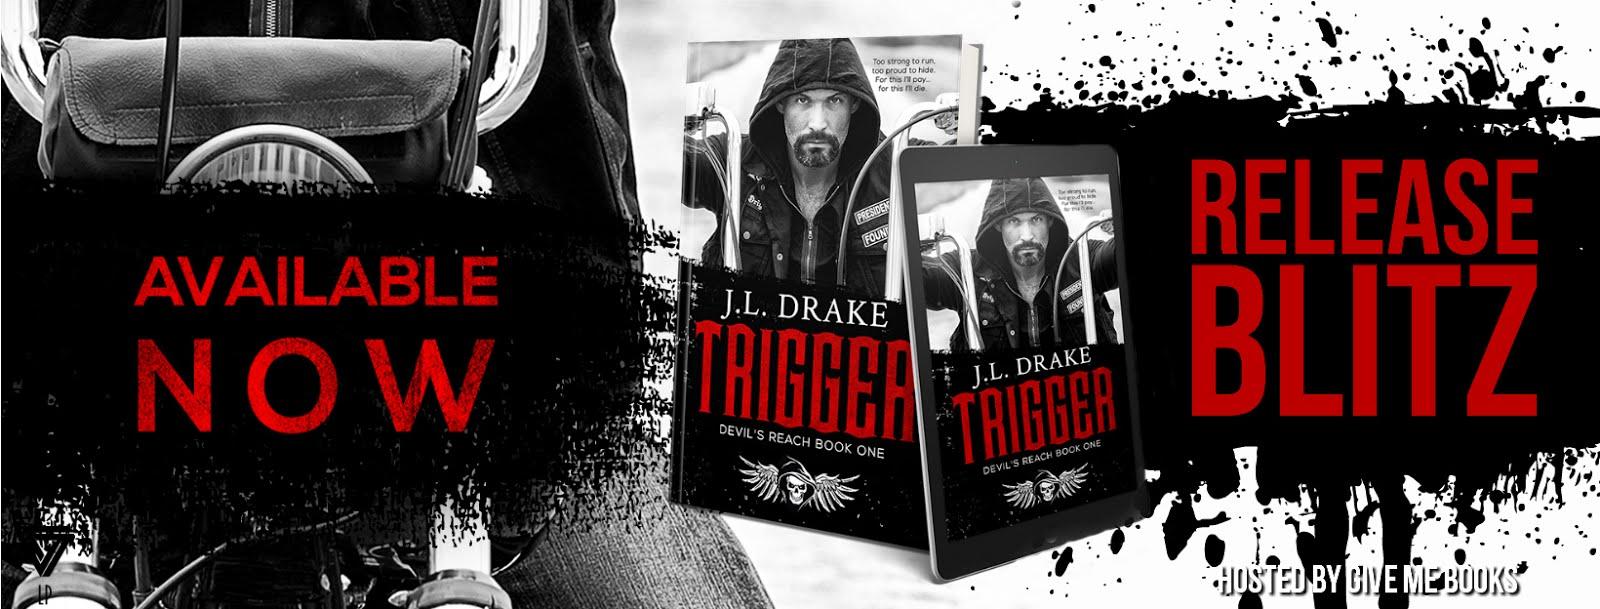 Trigger Release Blitz